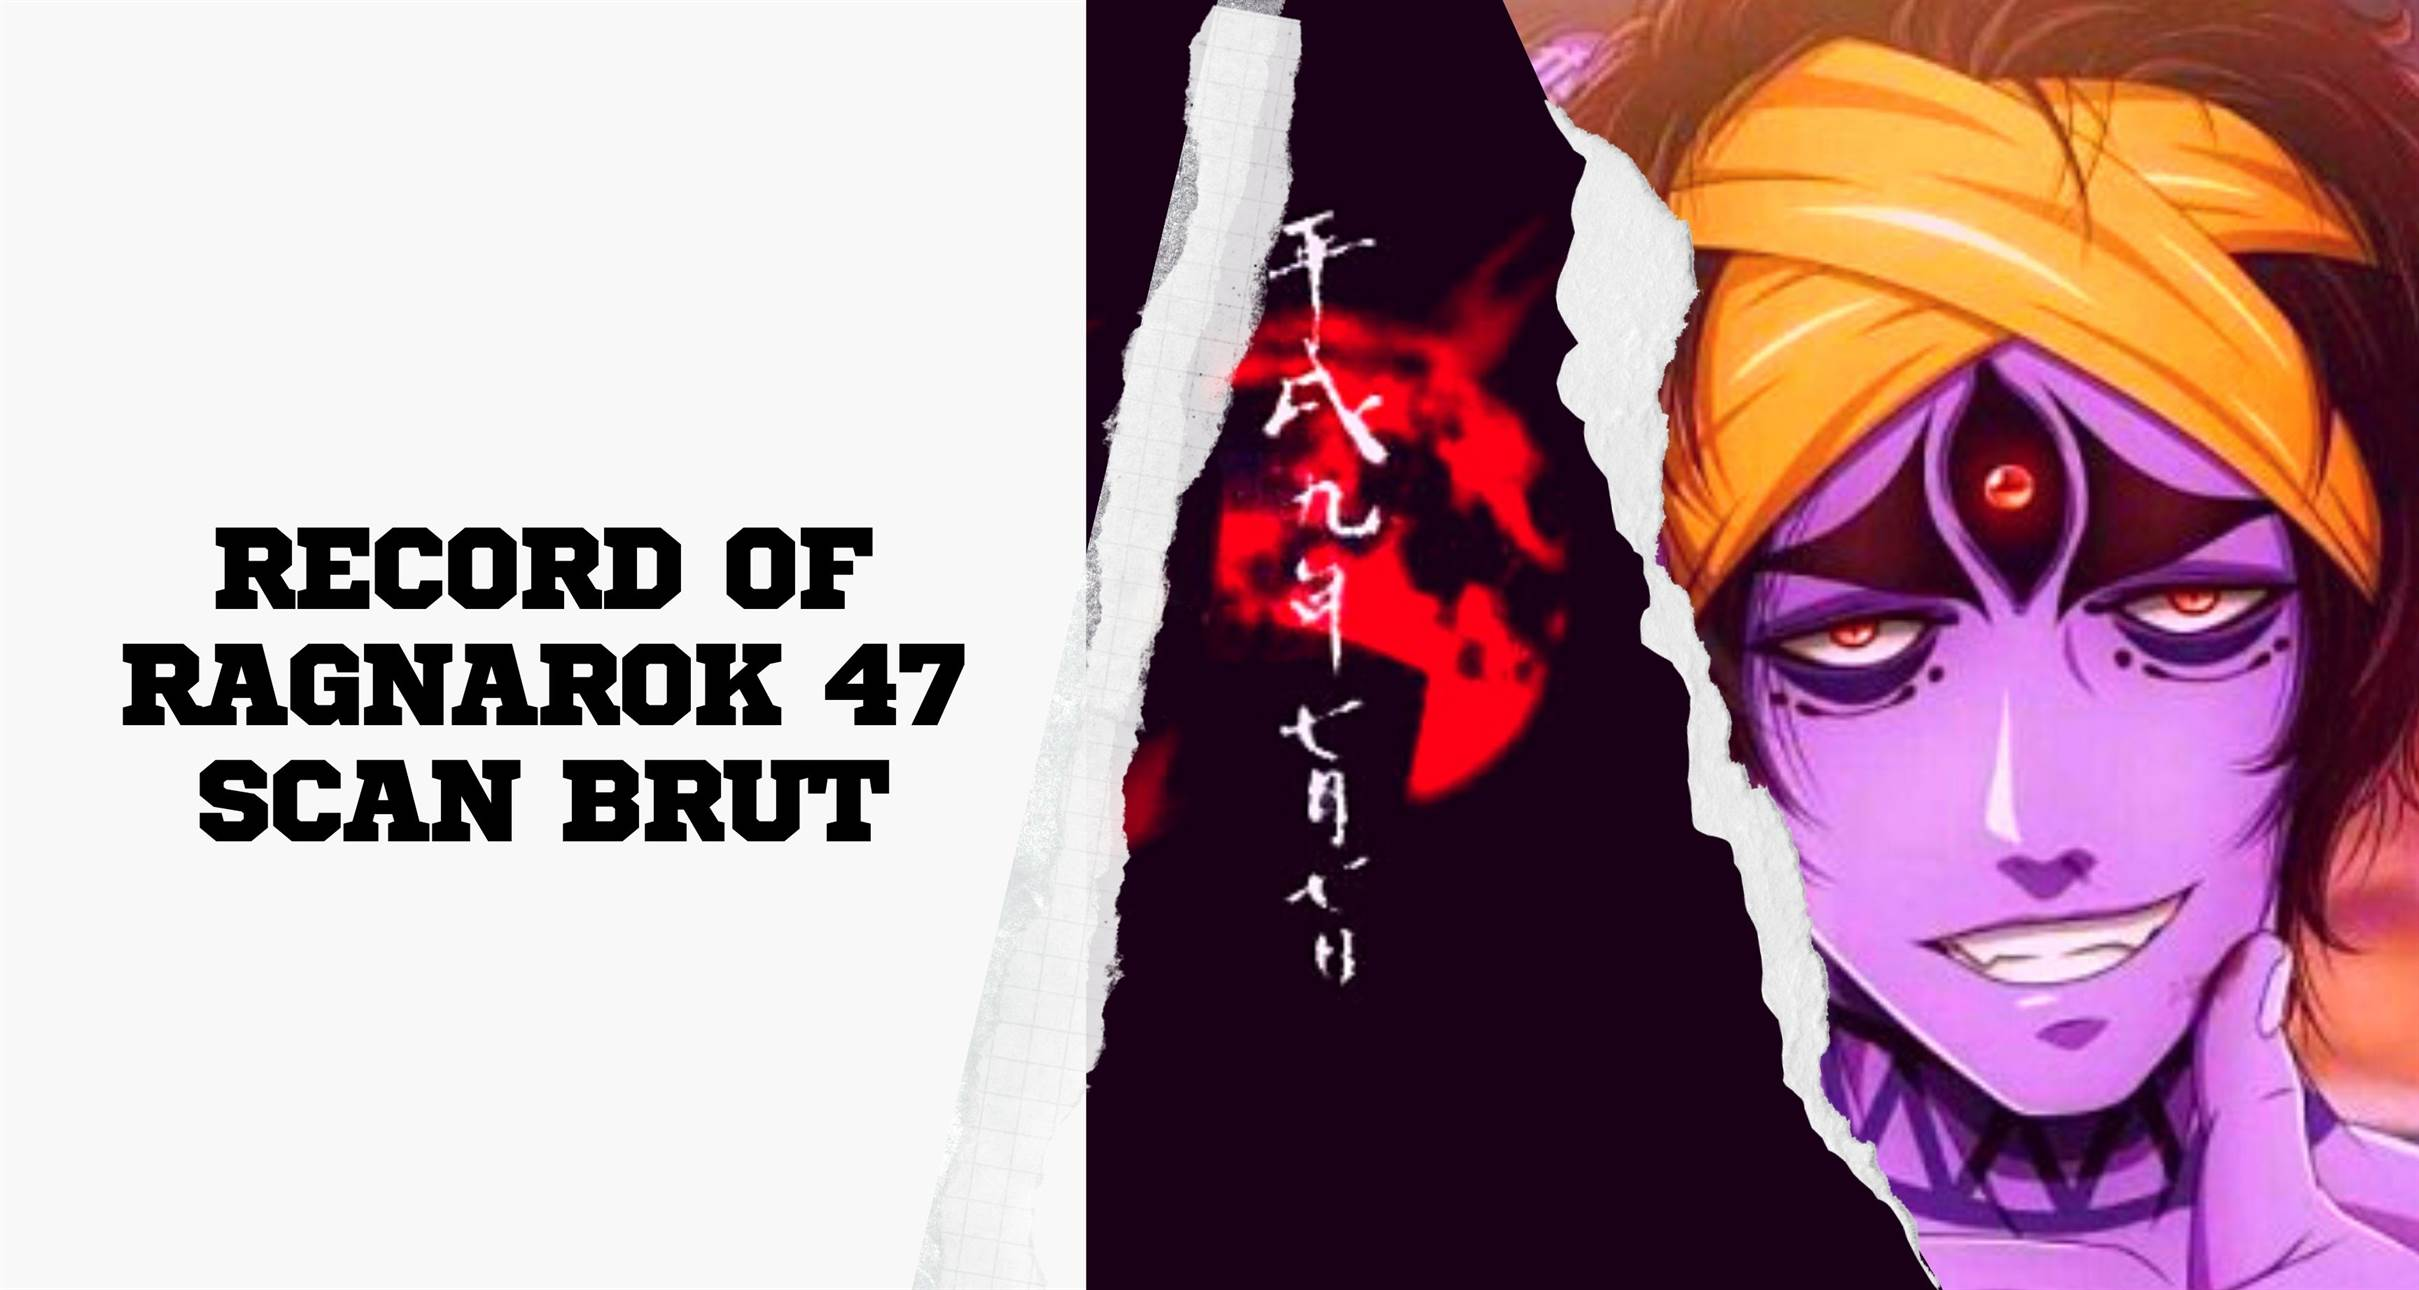 Record Of Ragnarok 47 Scan brut